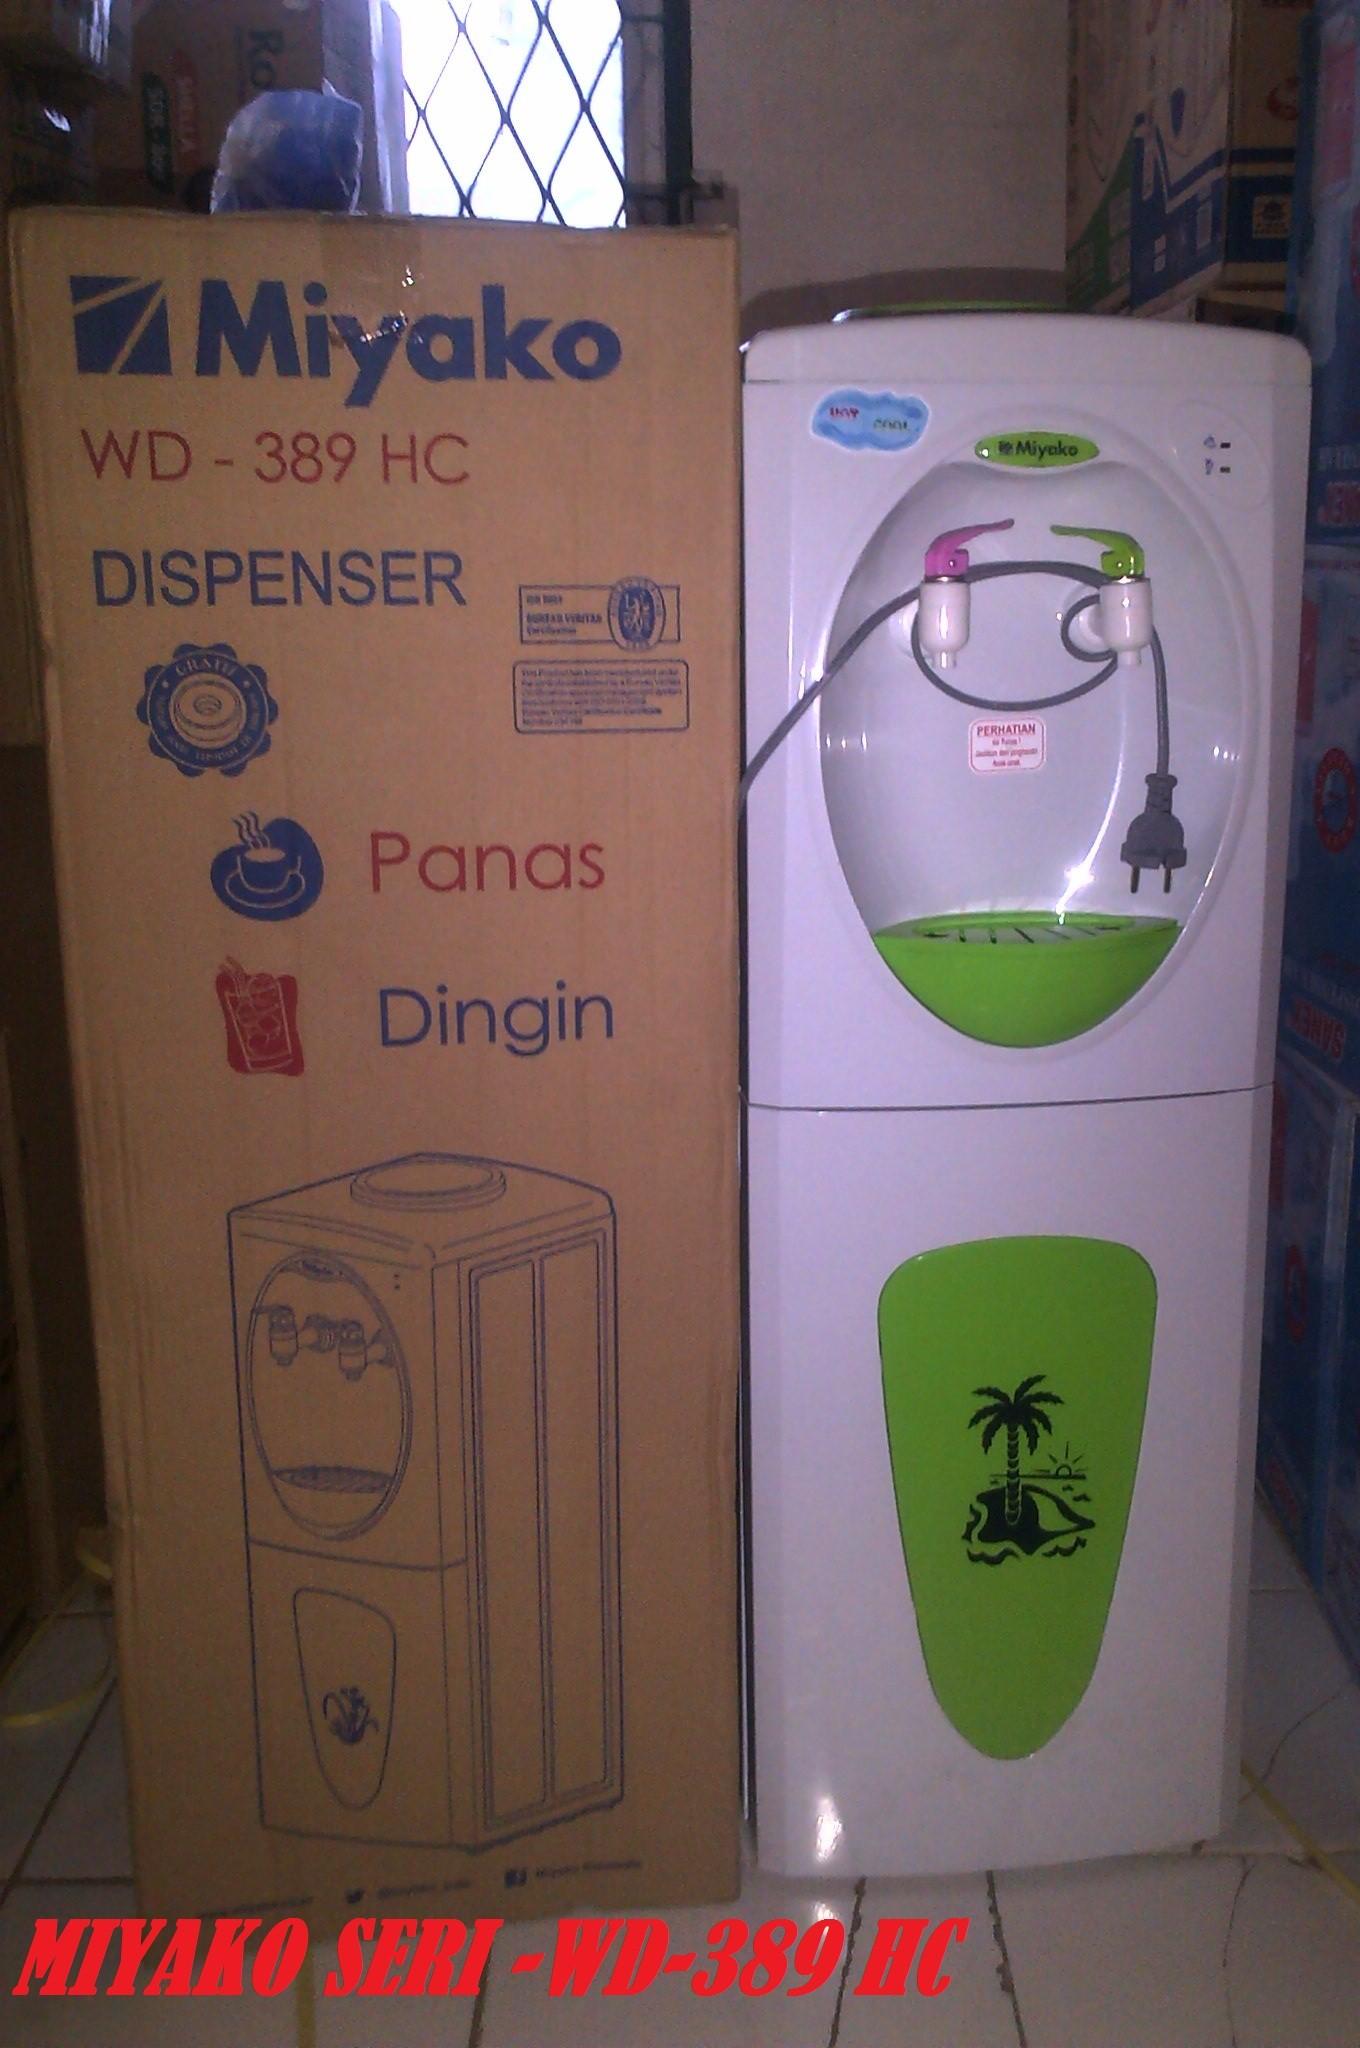 Jual Miyako Wd 19px Harga Dispenser Miyakocom Welcome To Www Cosmos Meja Hot Normal Cwd1170 389 Hc